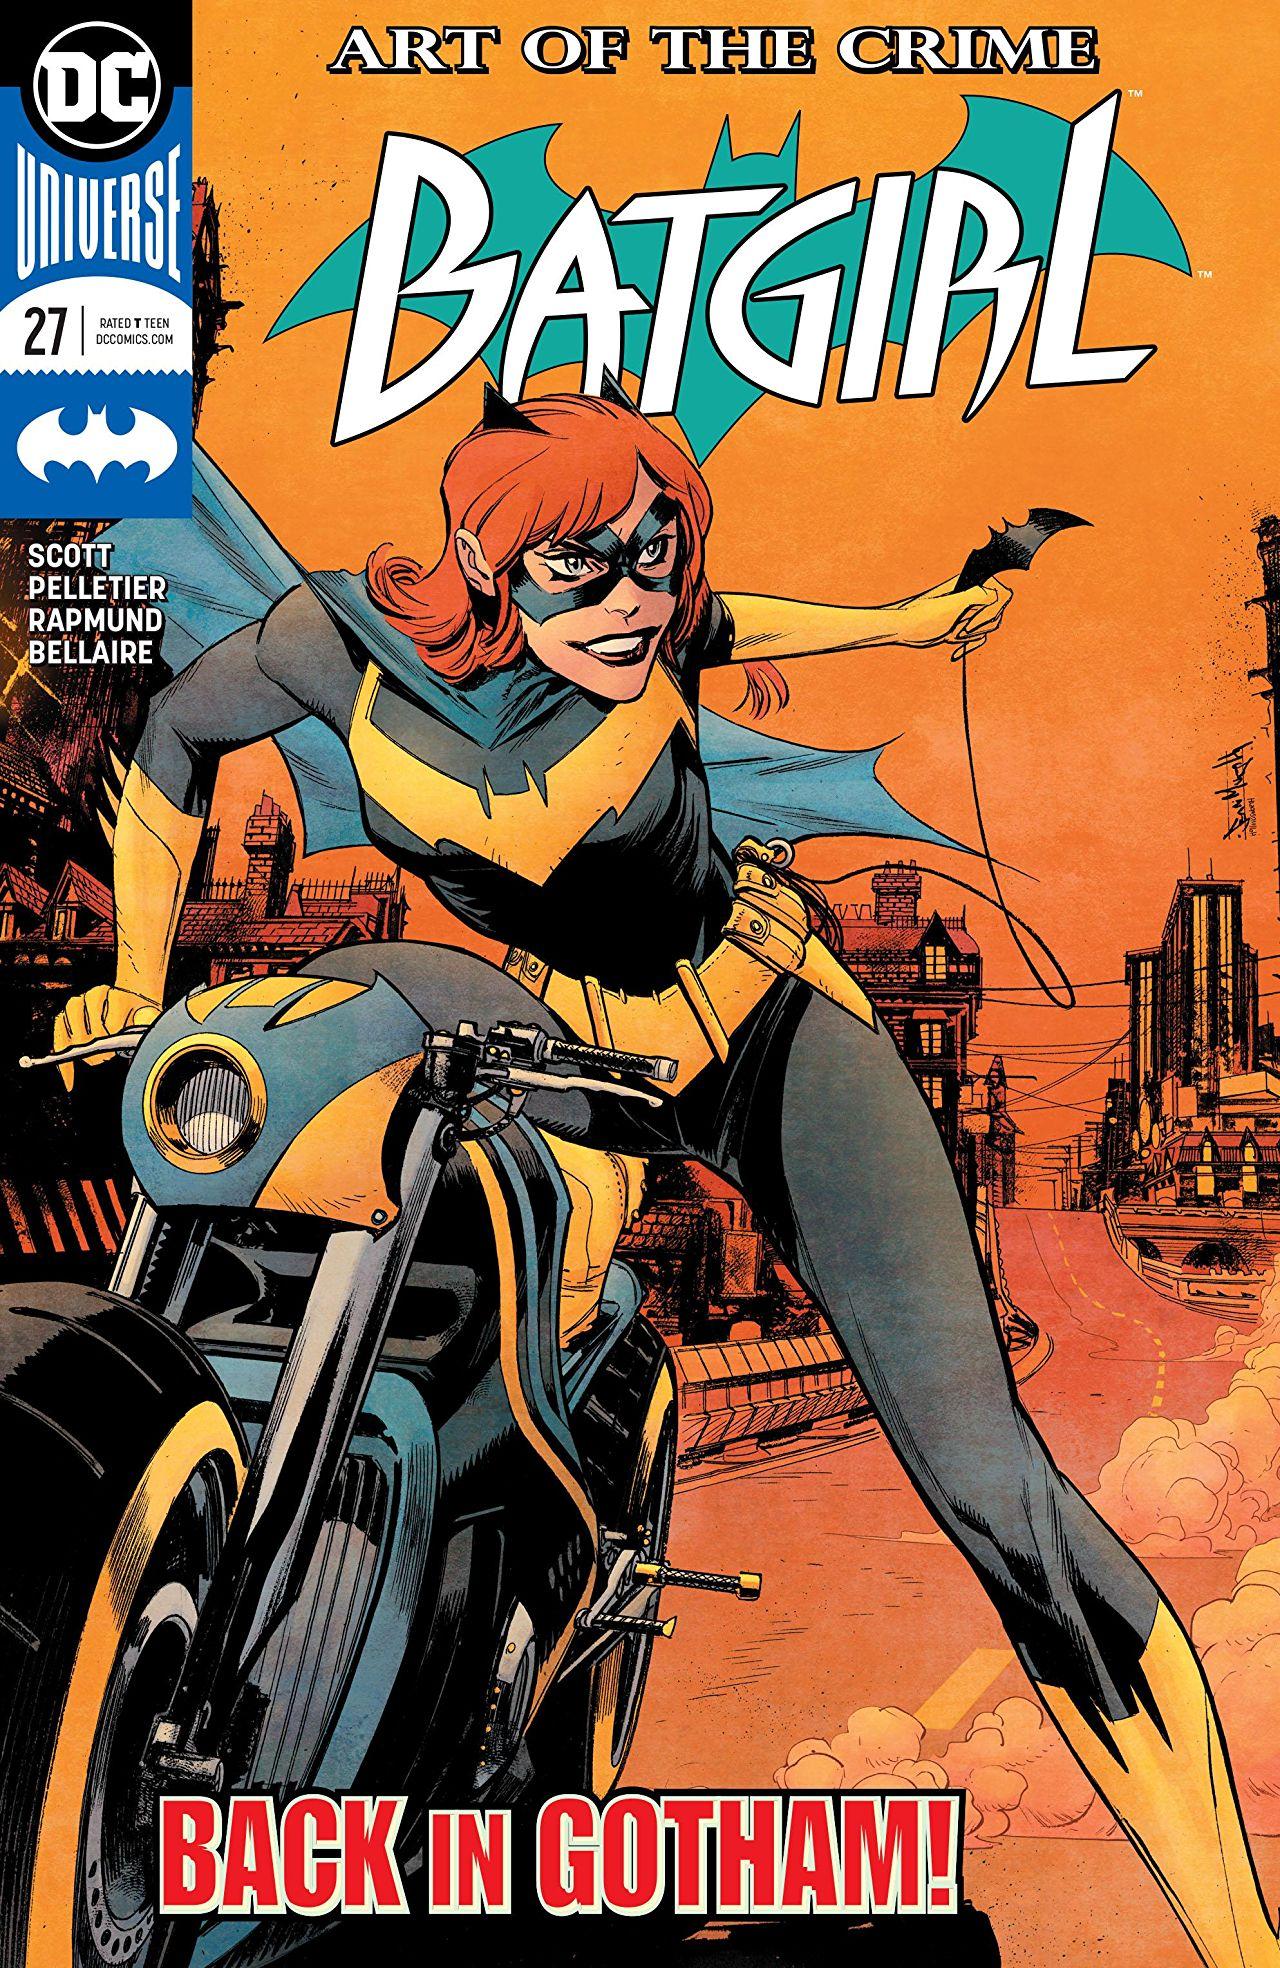 Batgirl #27 cover by Matt Hollingsworth and Sean Murphy